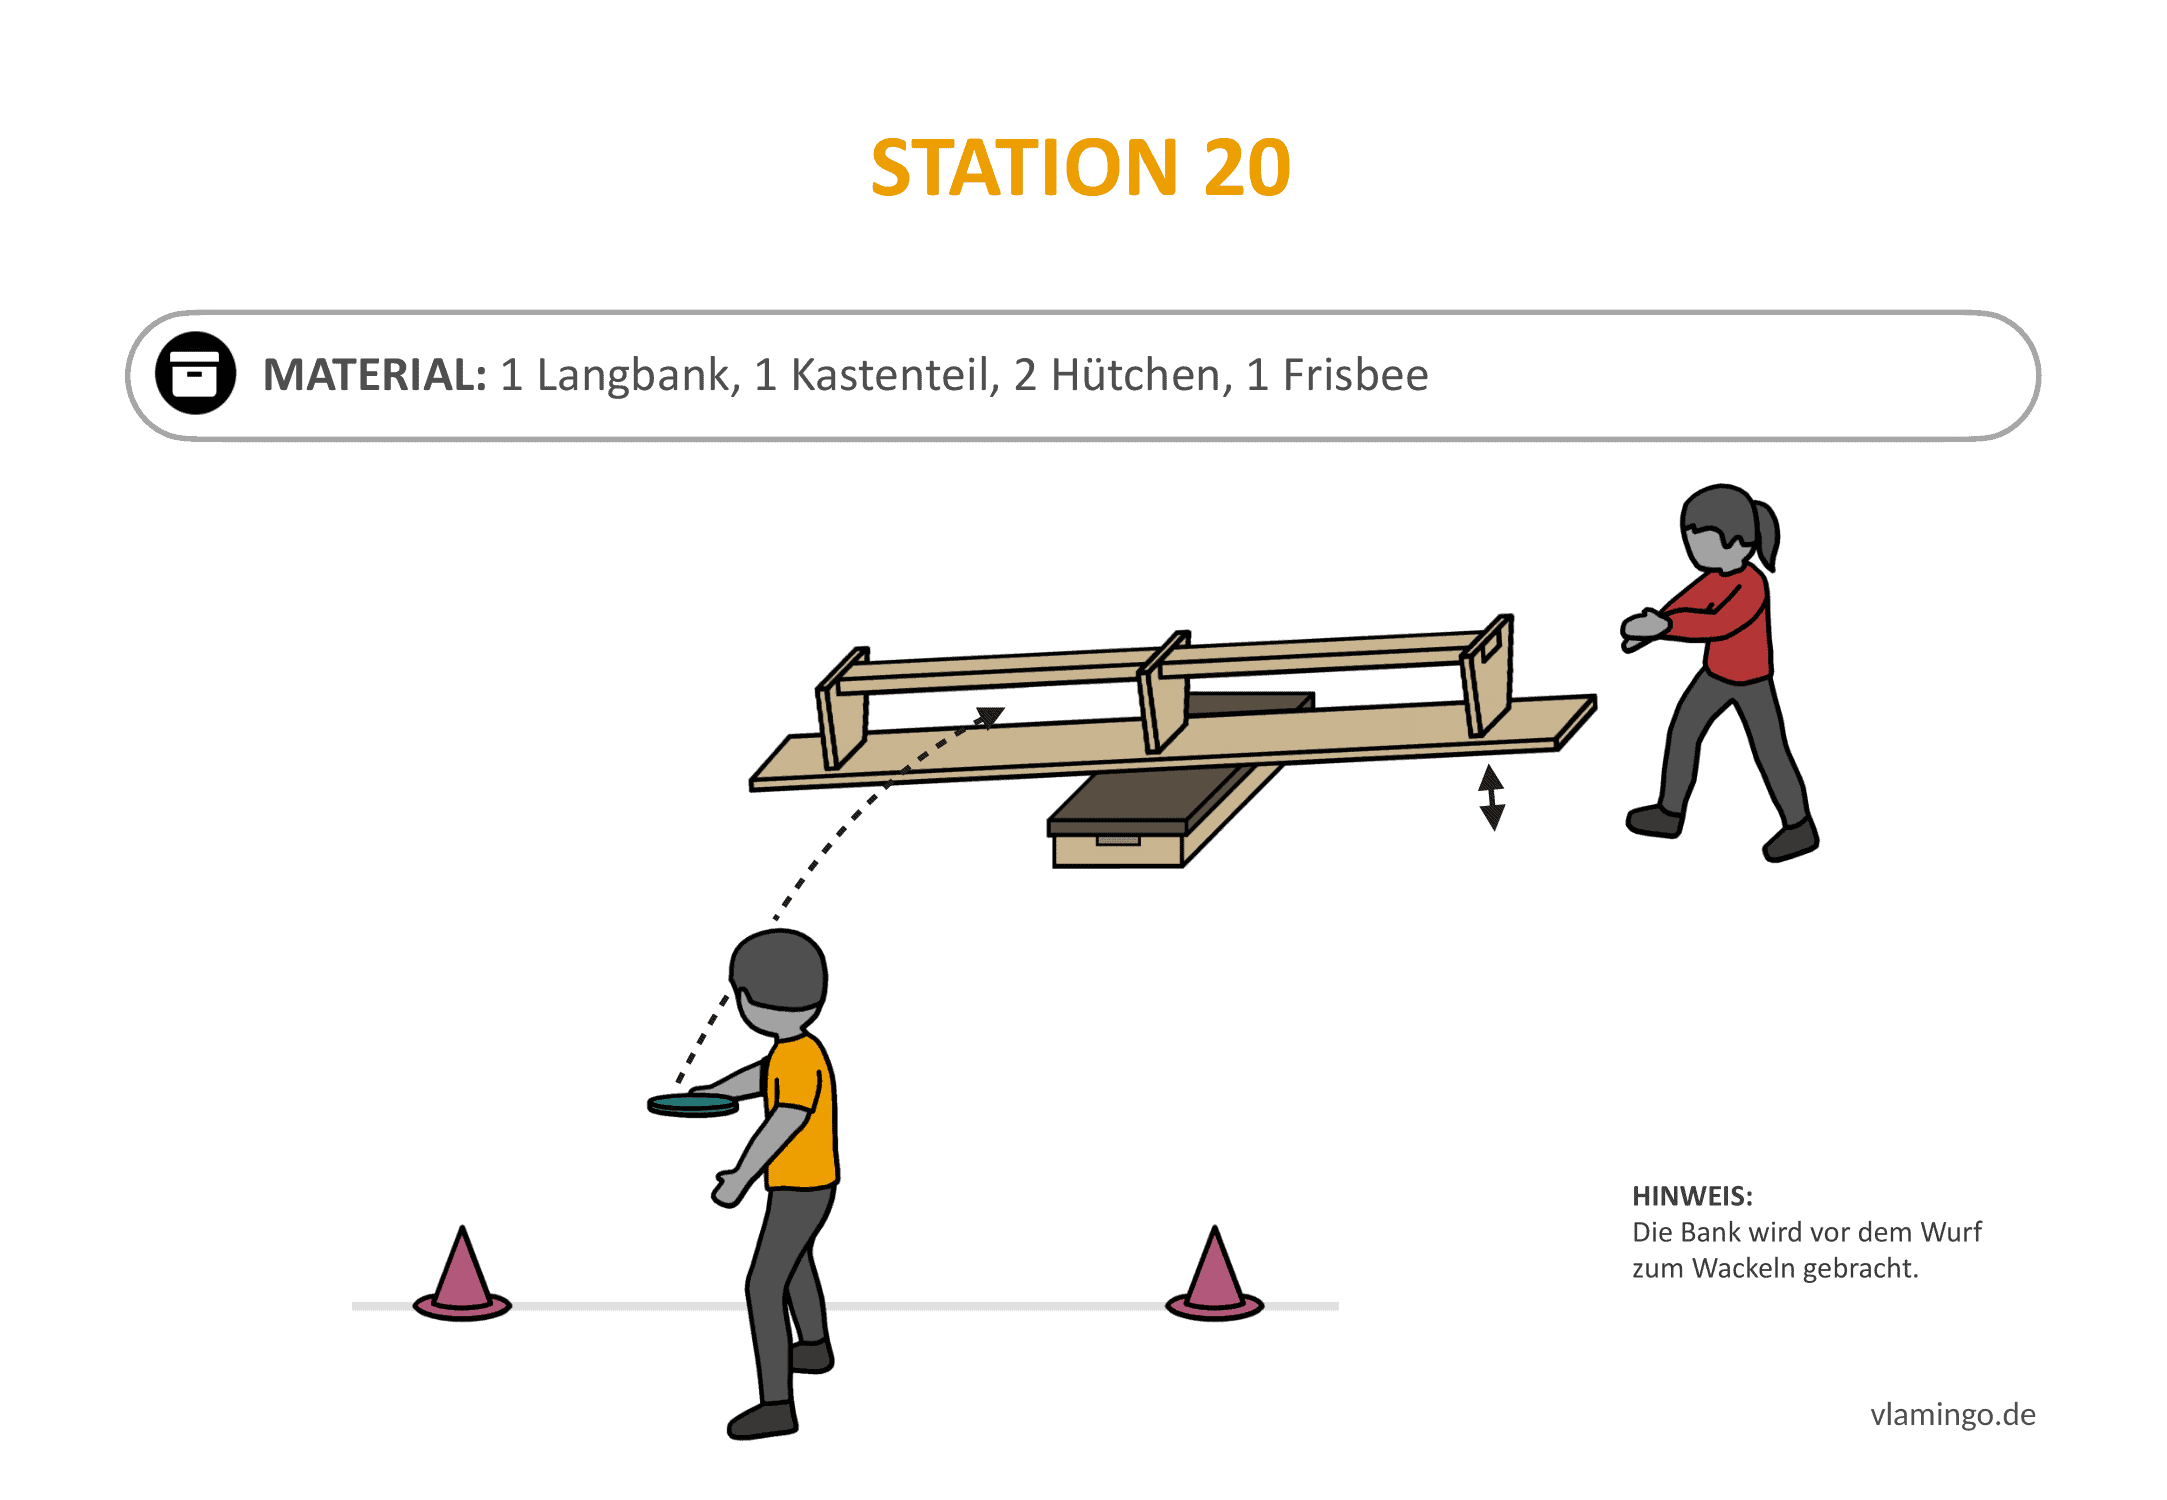 Frisbeegolf (Disc-Golf) - Station 20